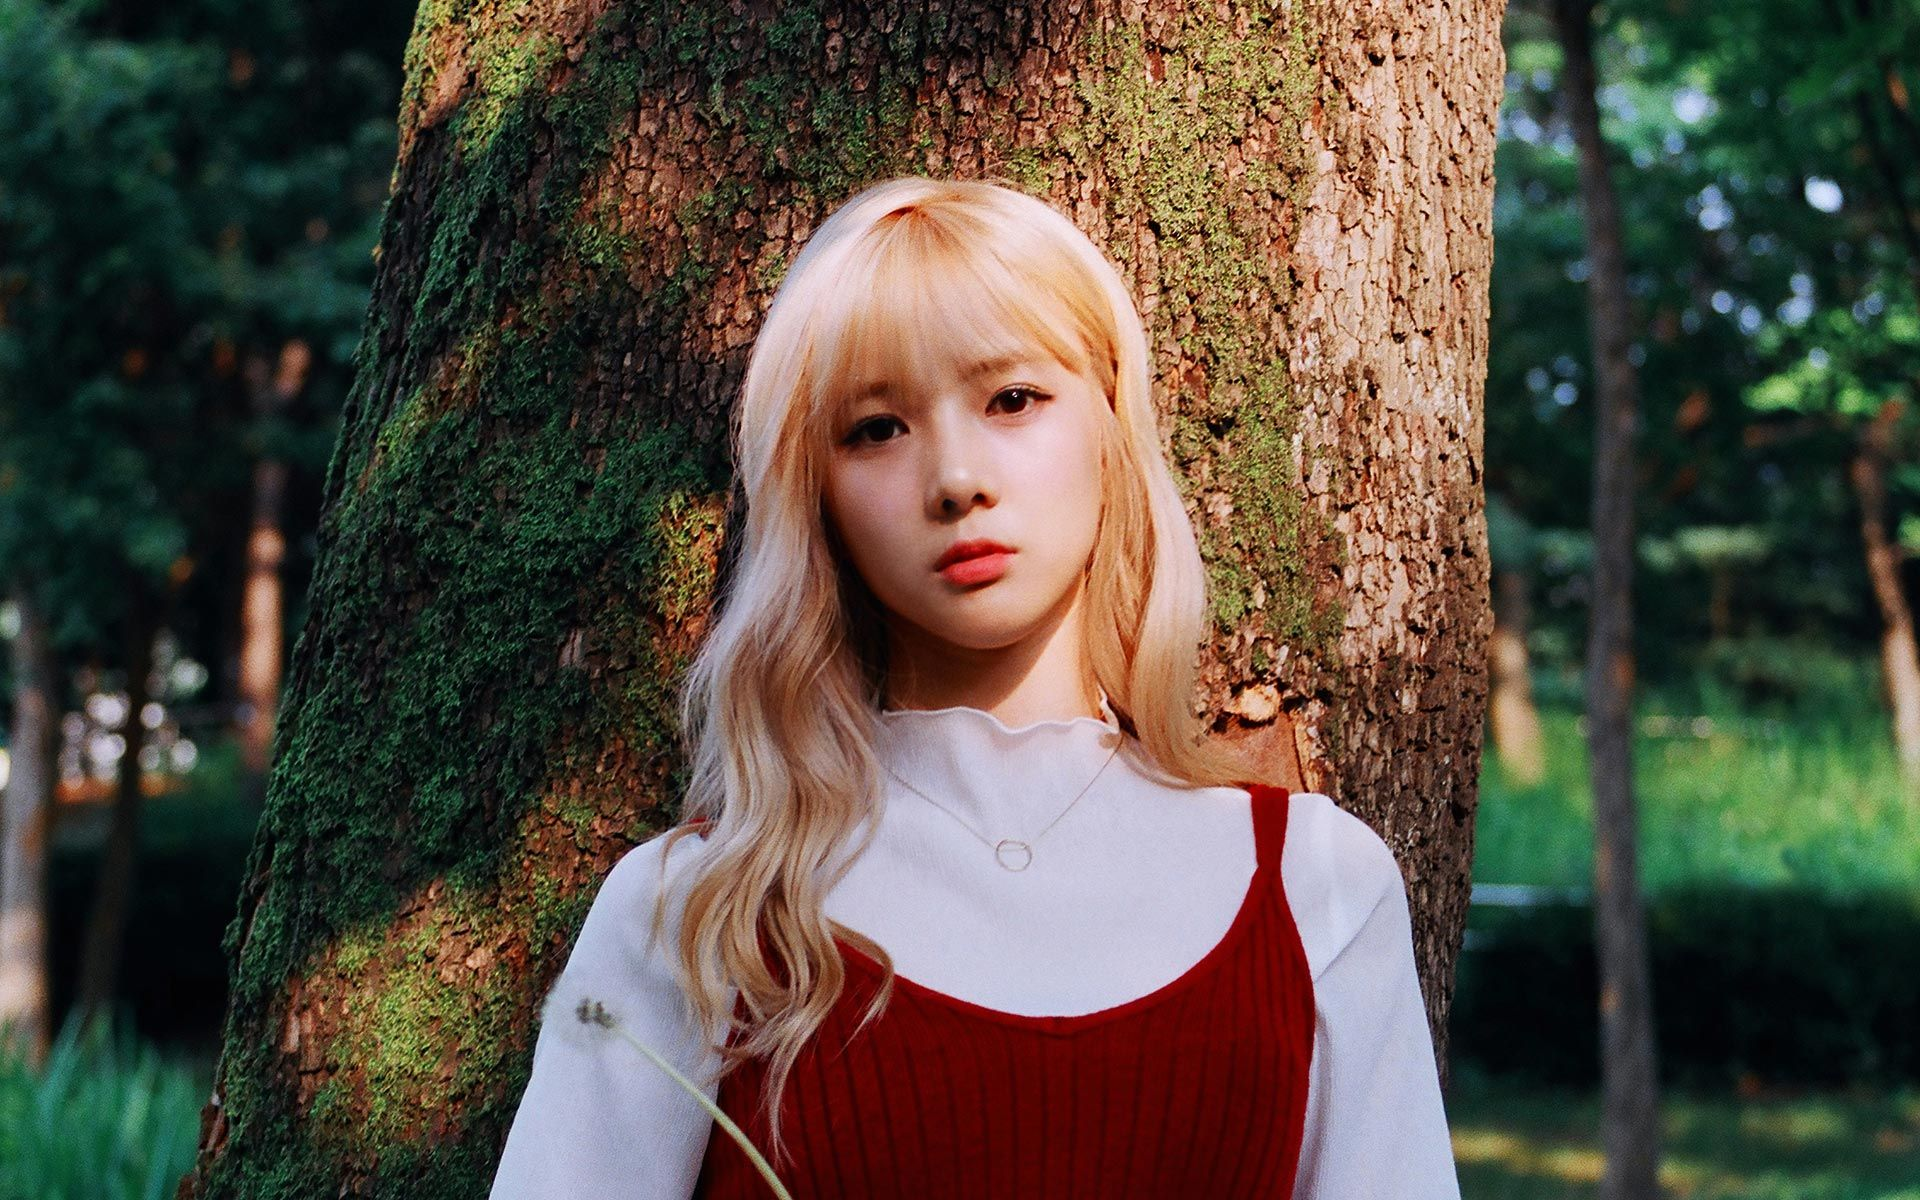 #Dreamcatcher #드림캐쳐 #Yoohyeon